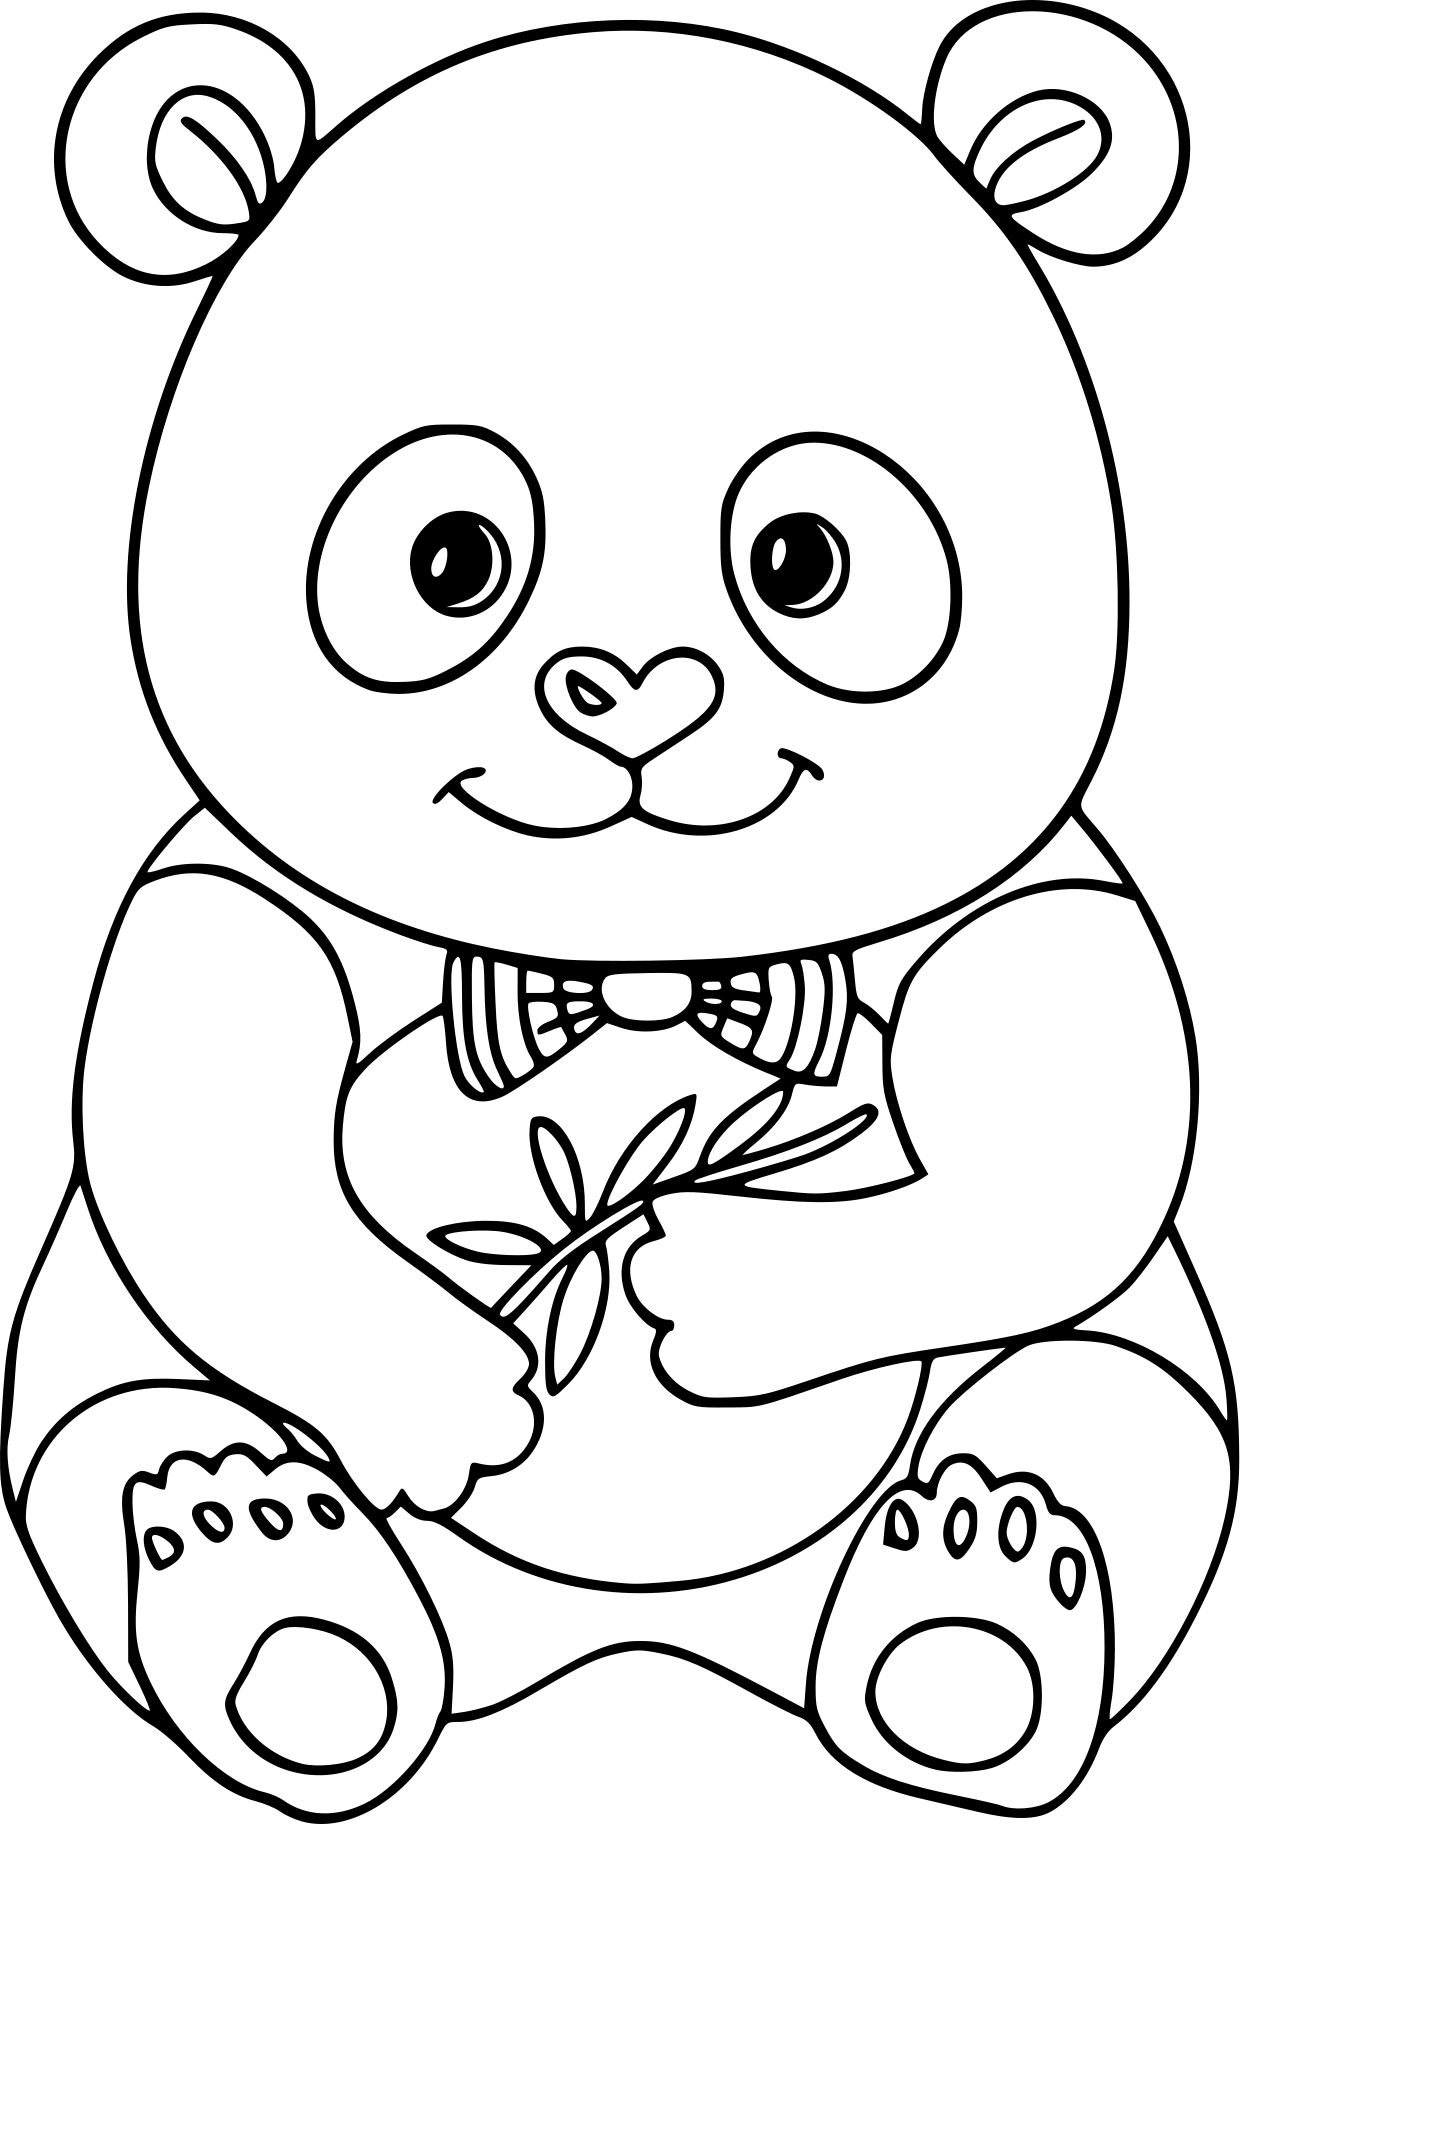 Coloriage panda imprimer - Coloriage a imprimer panda ...